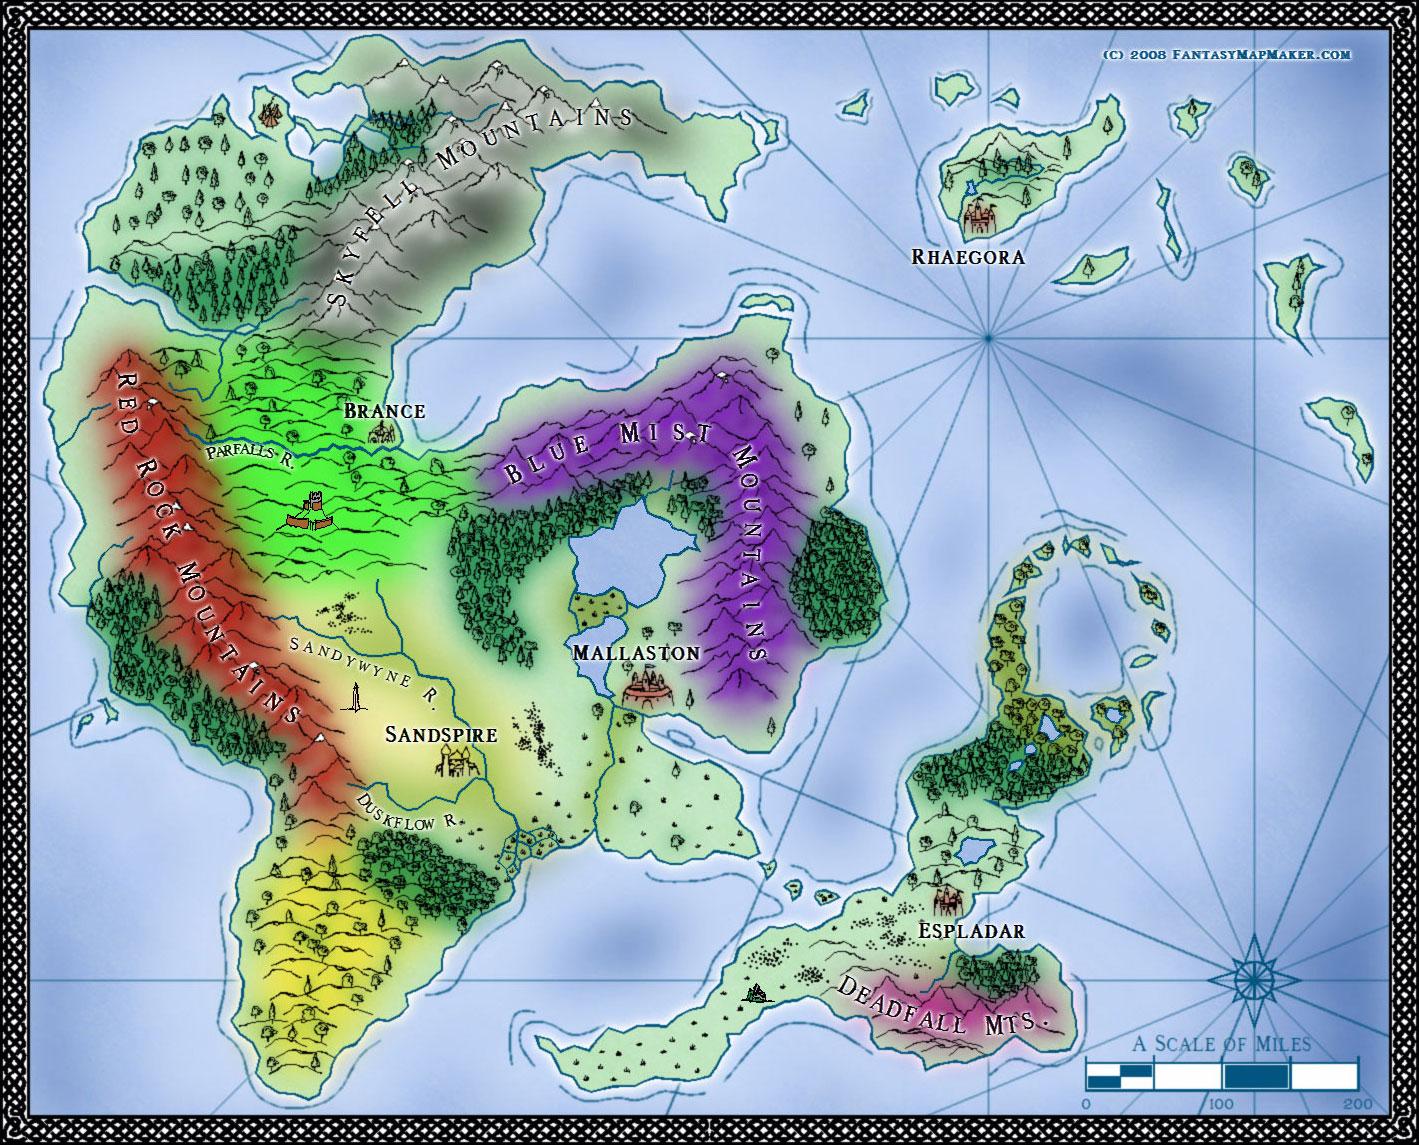 Sarah Wroot style map